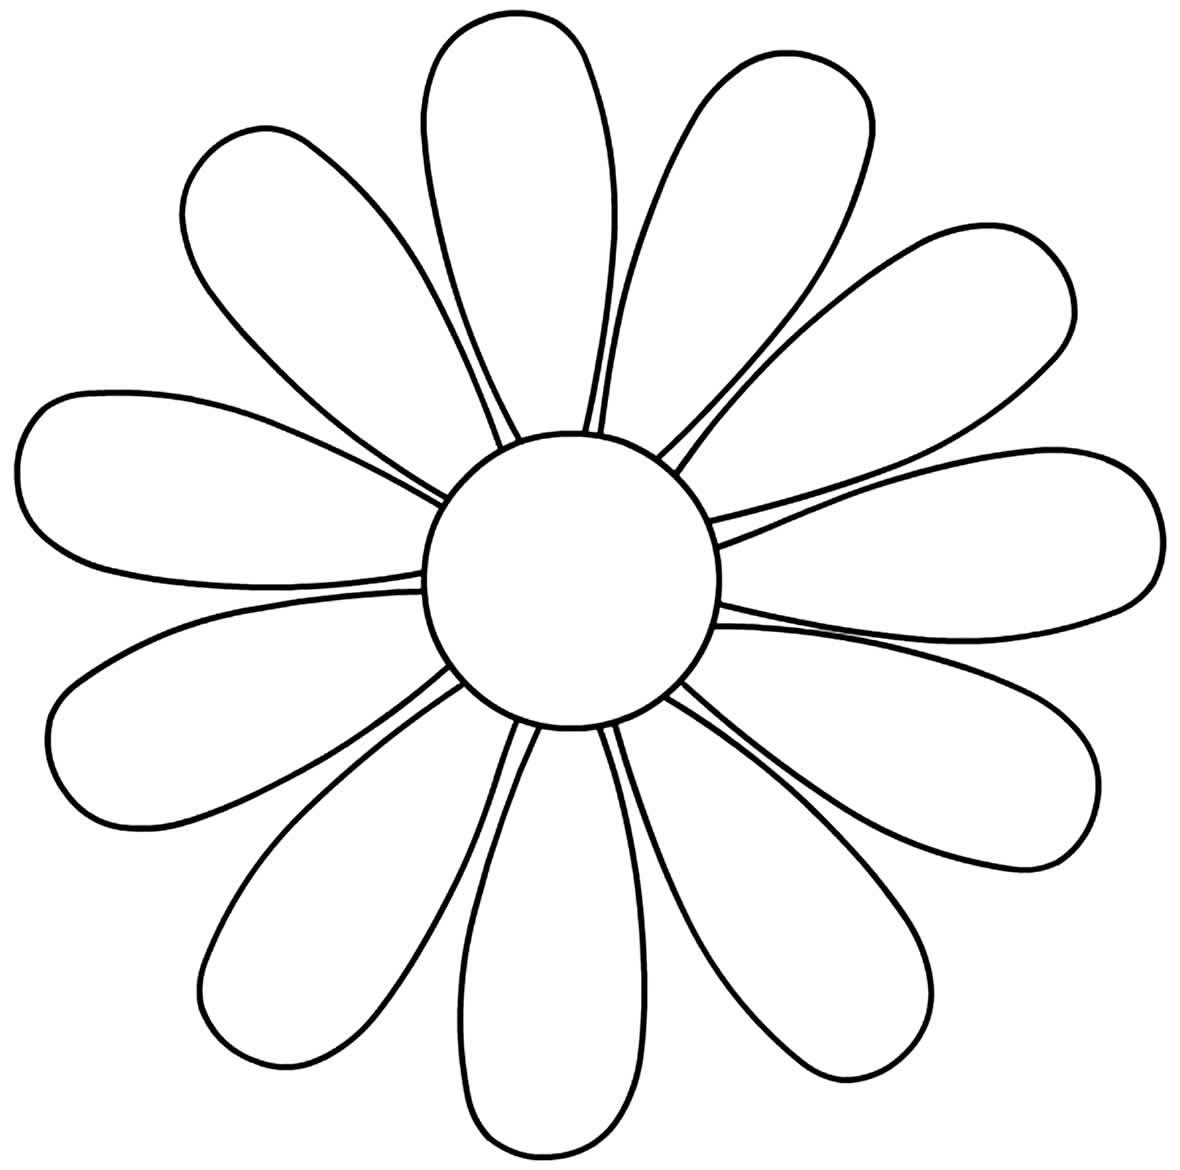 Molde de flor